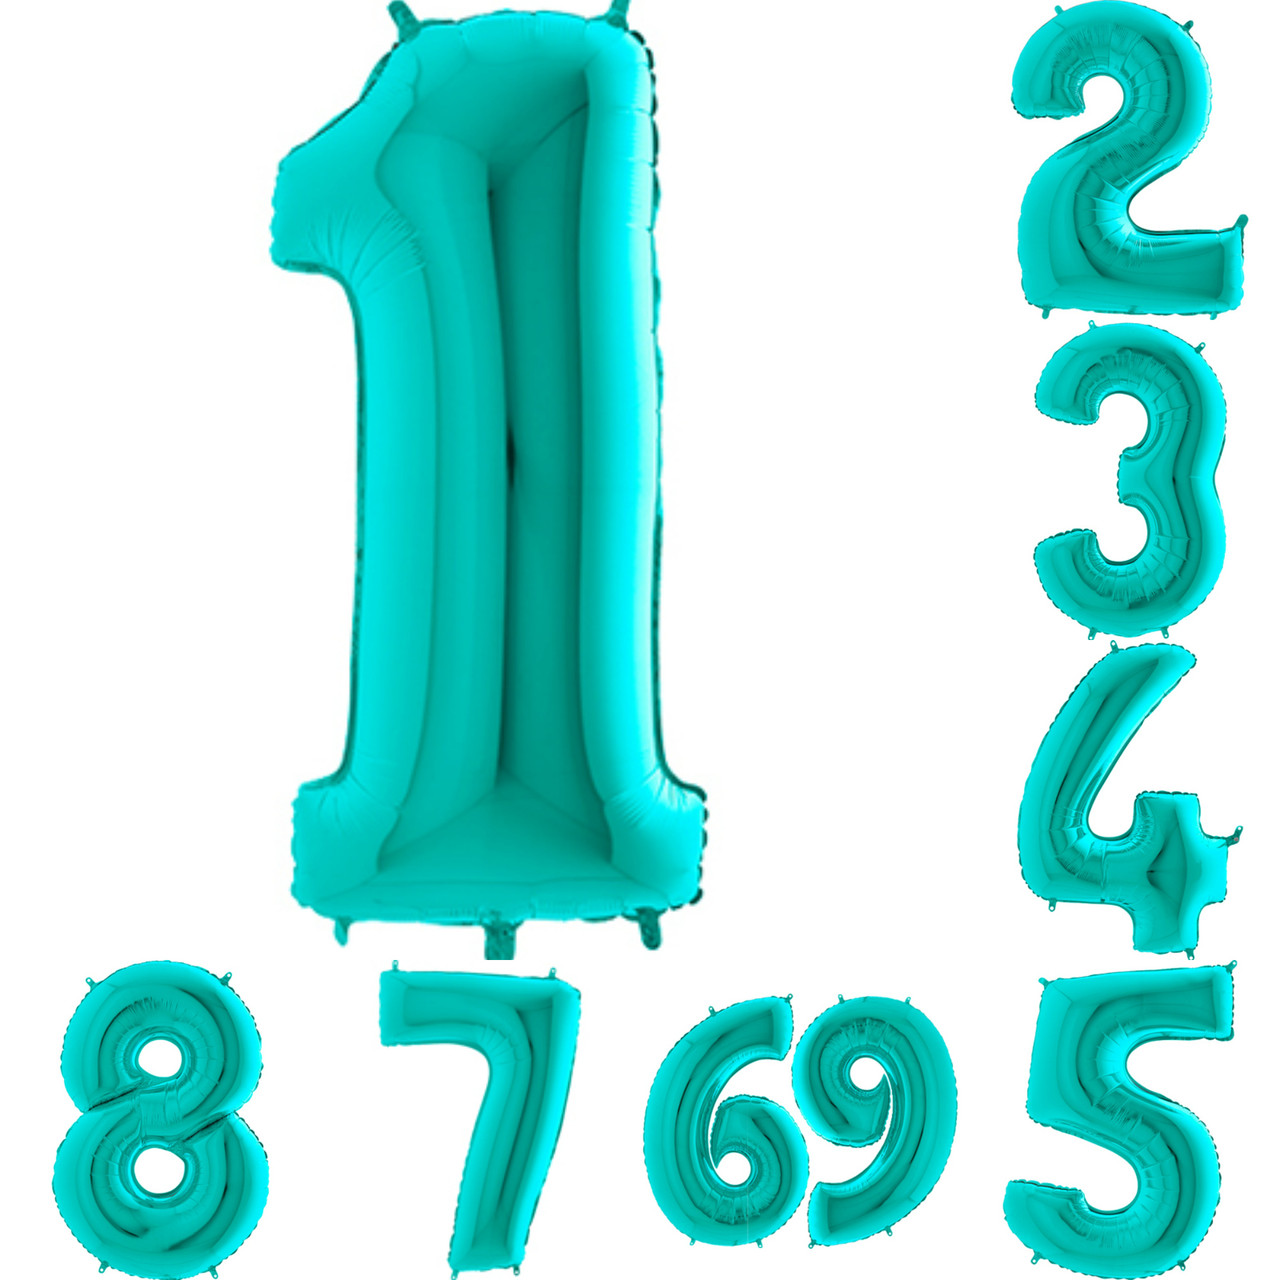 Цифры цвета Тиффани